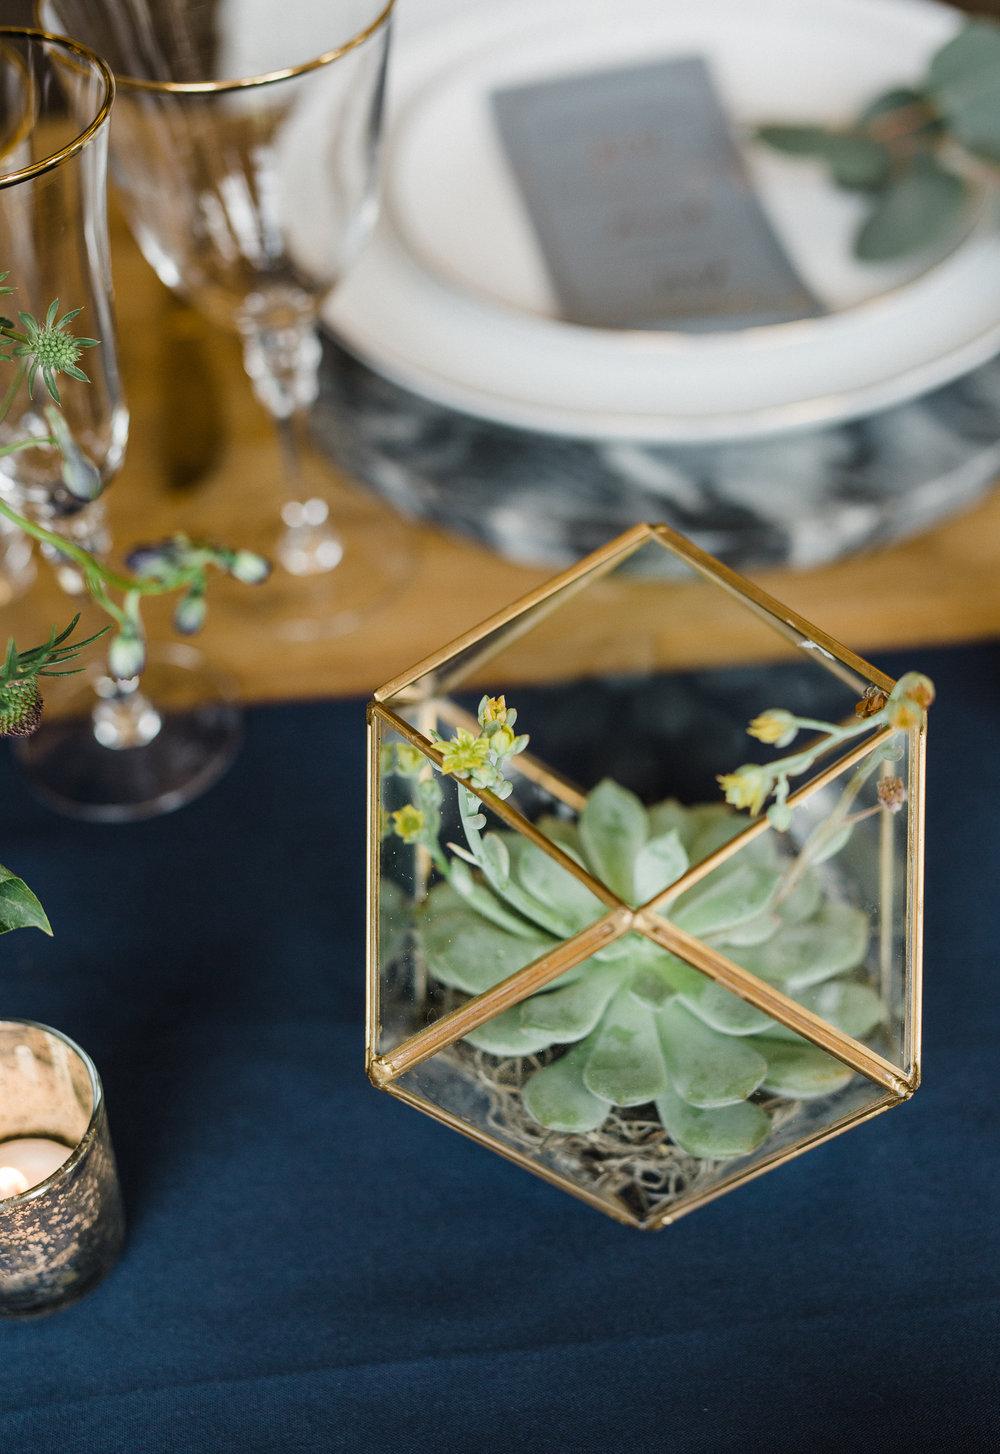 www.santabarbarawedding.com | Los Robles Greens | Besame Floral Events | Rachel Birkhofer | Styled Shoot | Reception Table Details